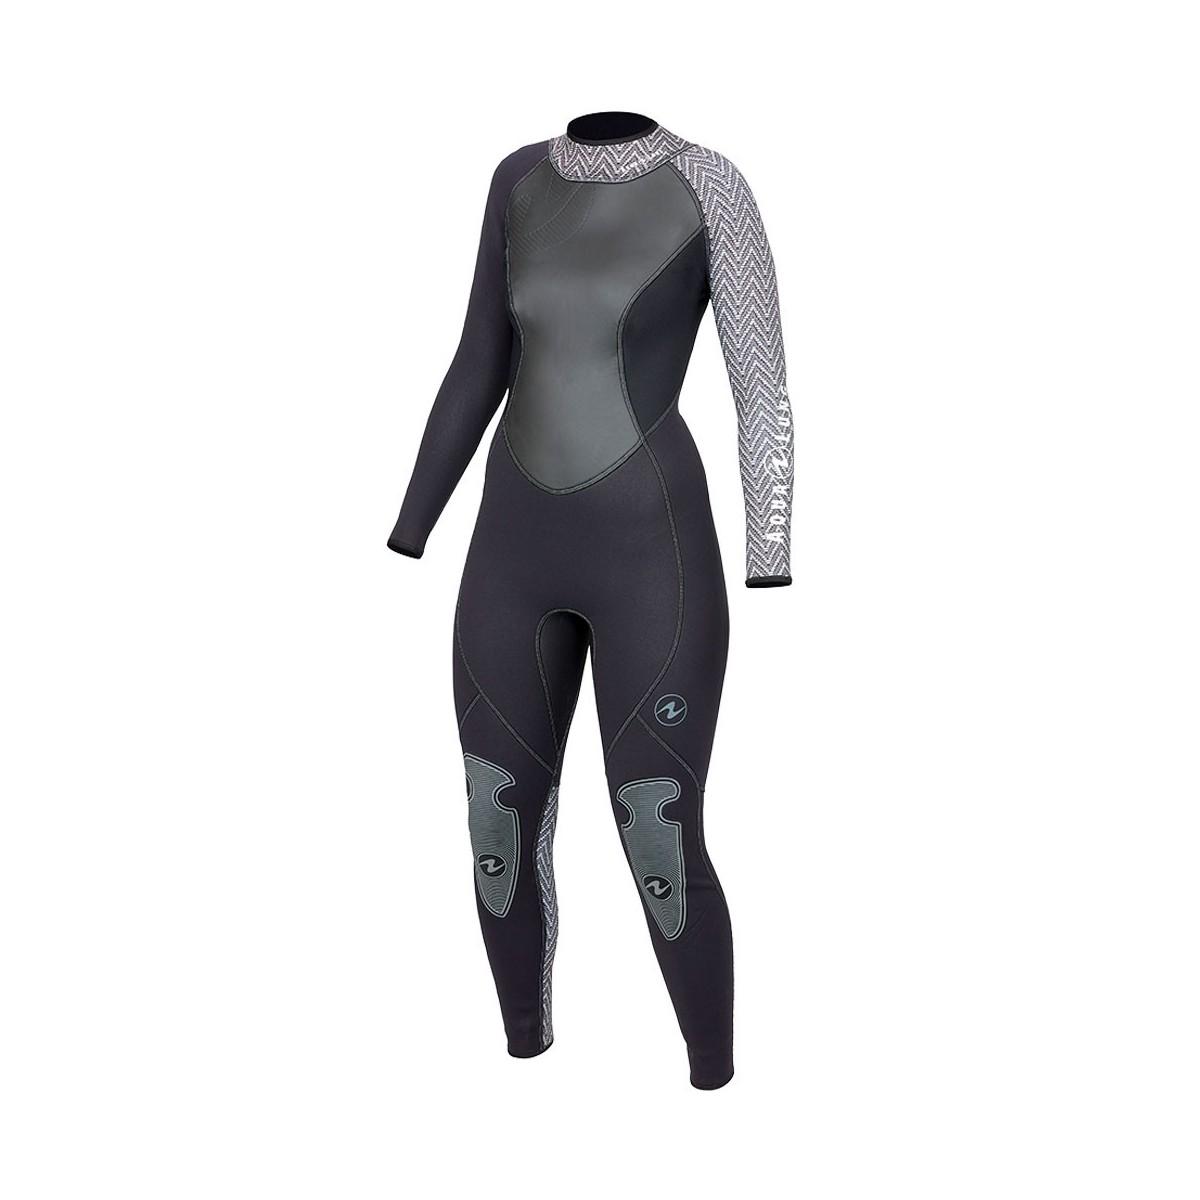 Aqua Lung Women's HydroFlex 1mm Jumpsuit